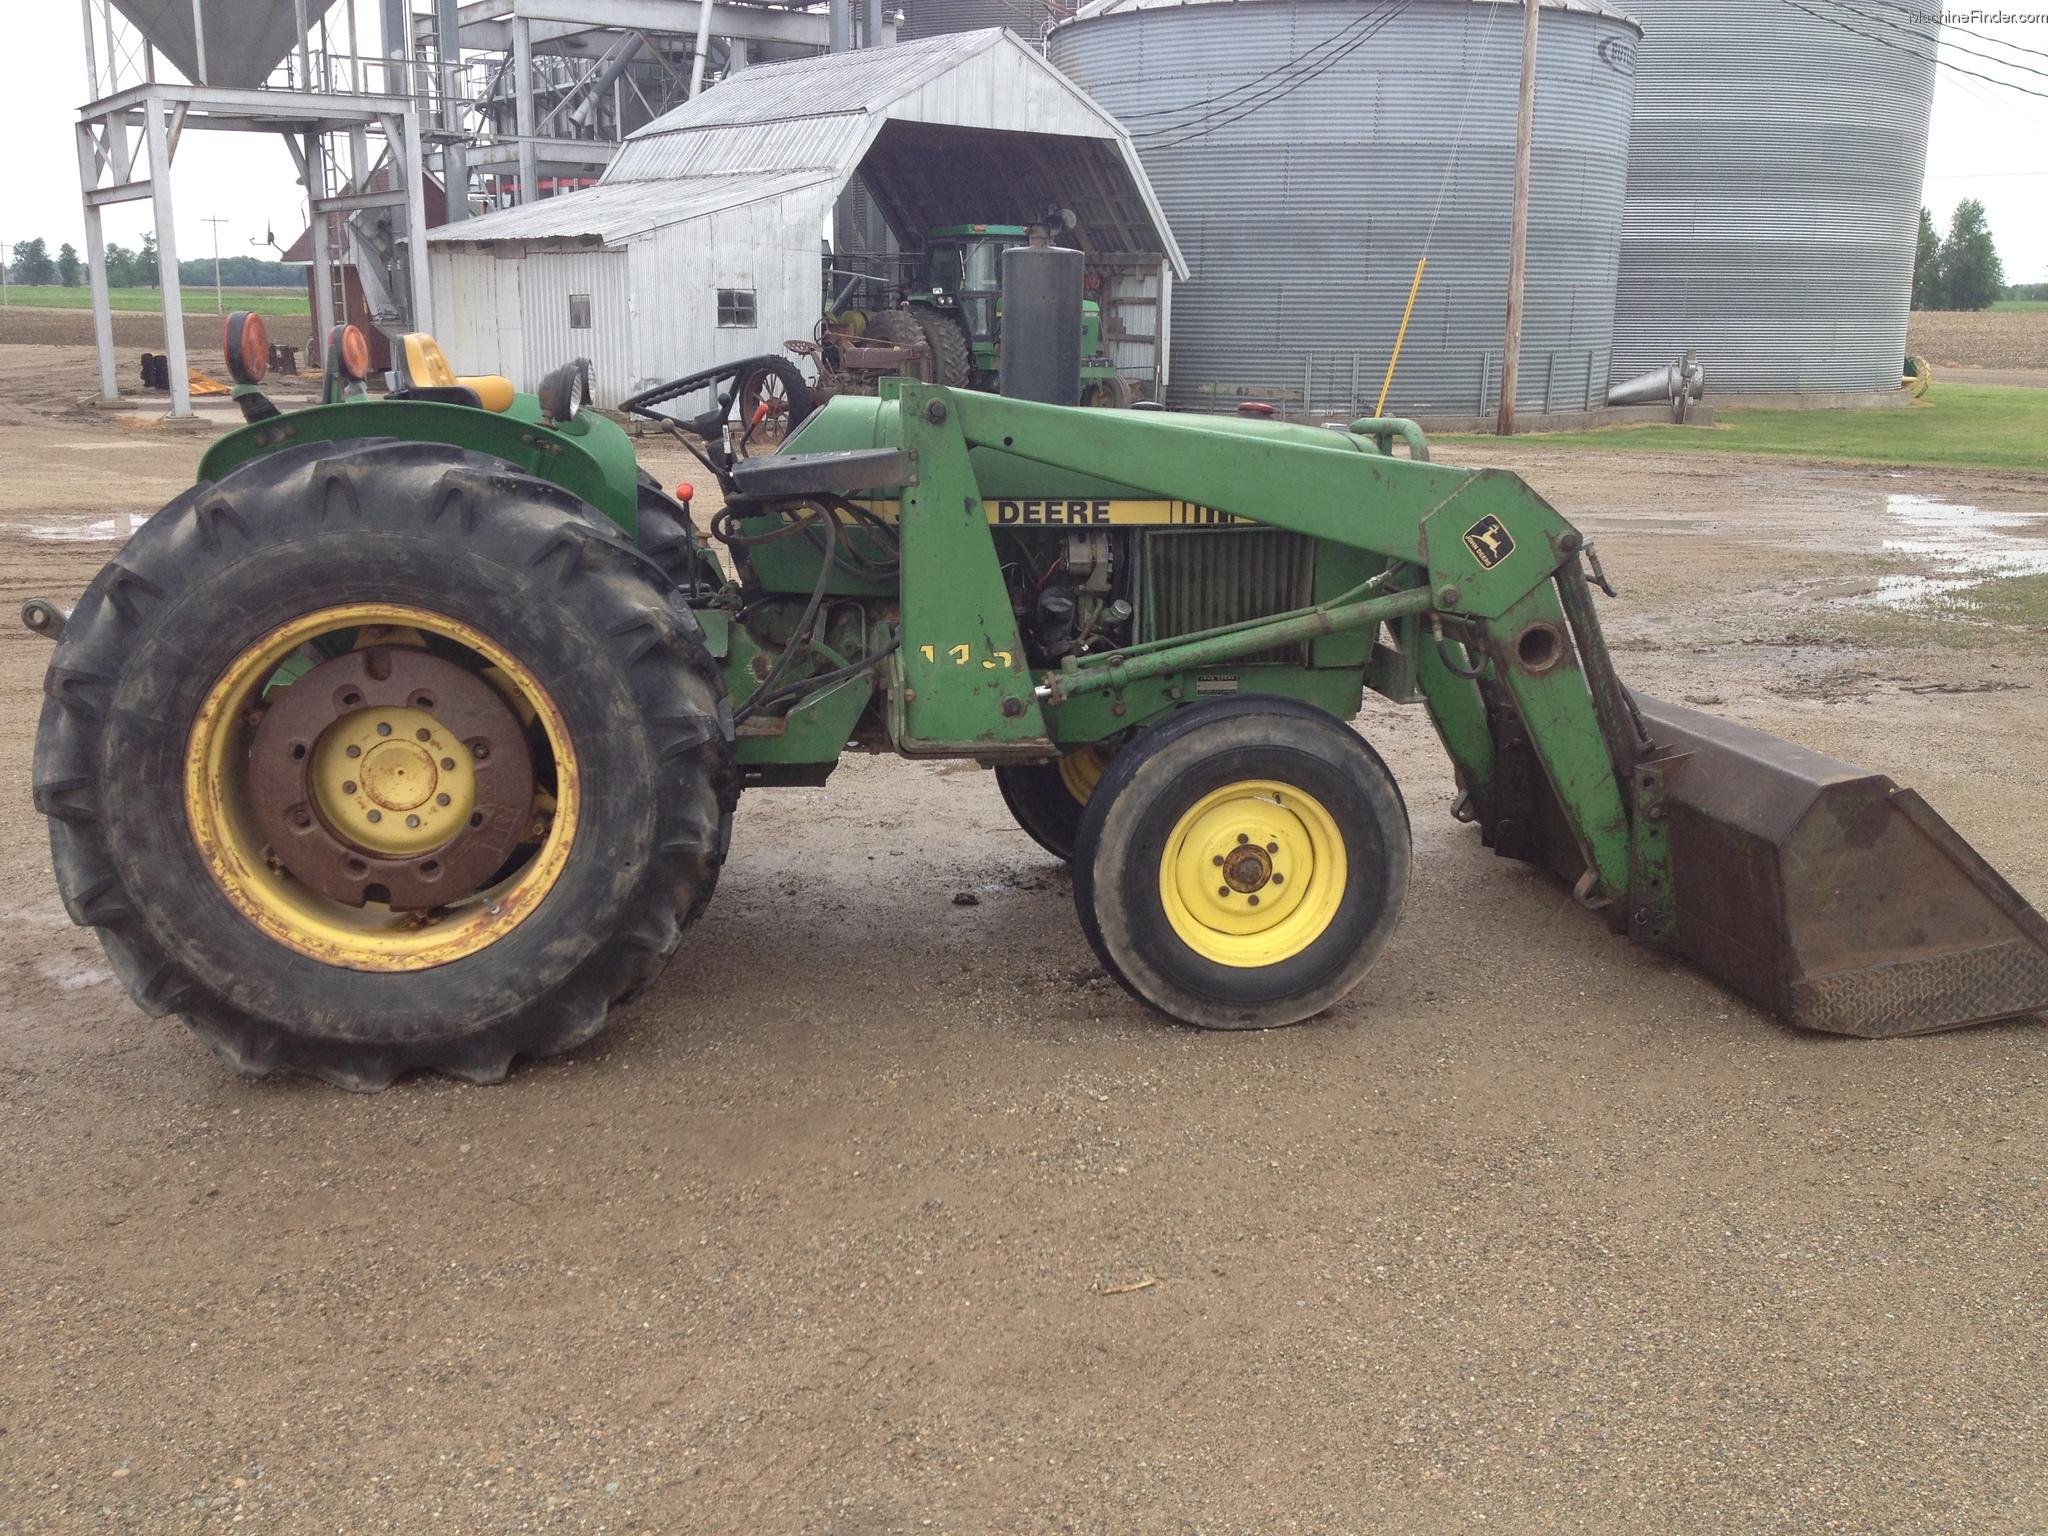 1980 John Deere 2240 Tractors - Compact (1-40hp.) - John ...